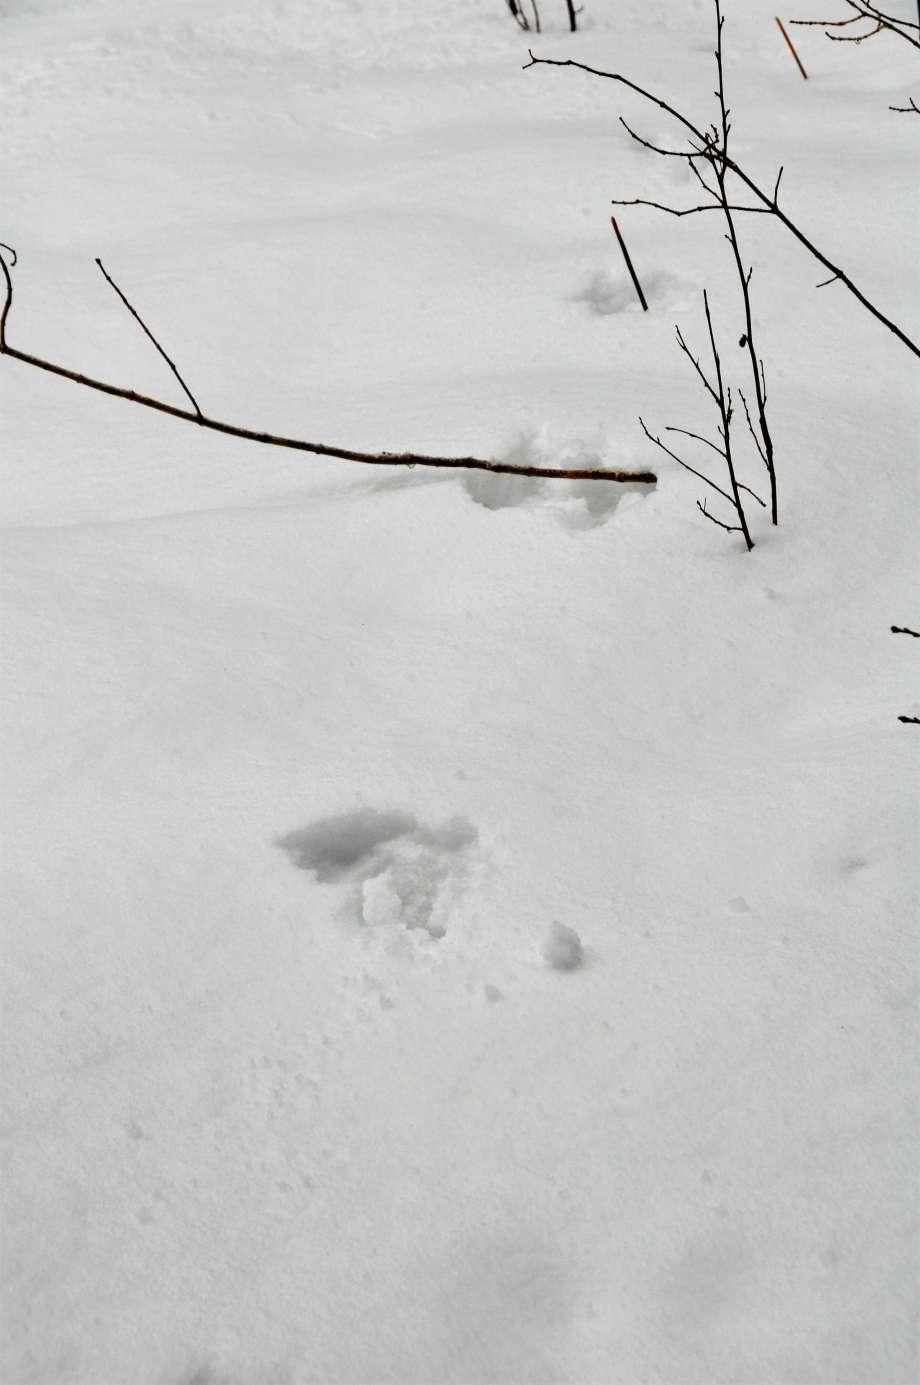 mårdspår i snön